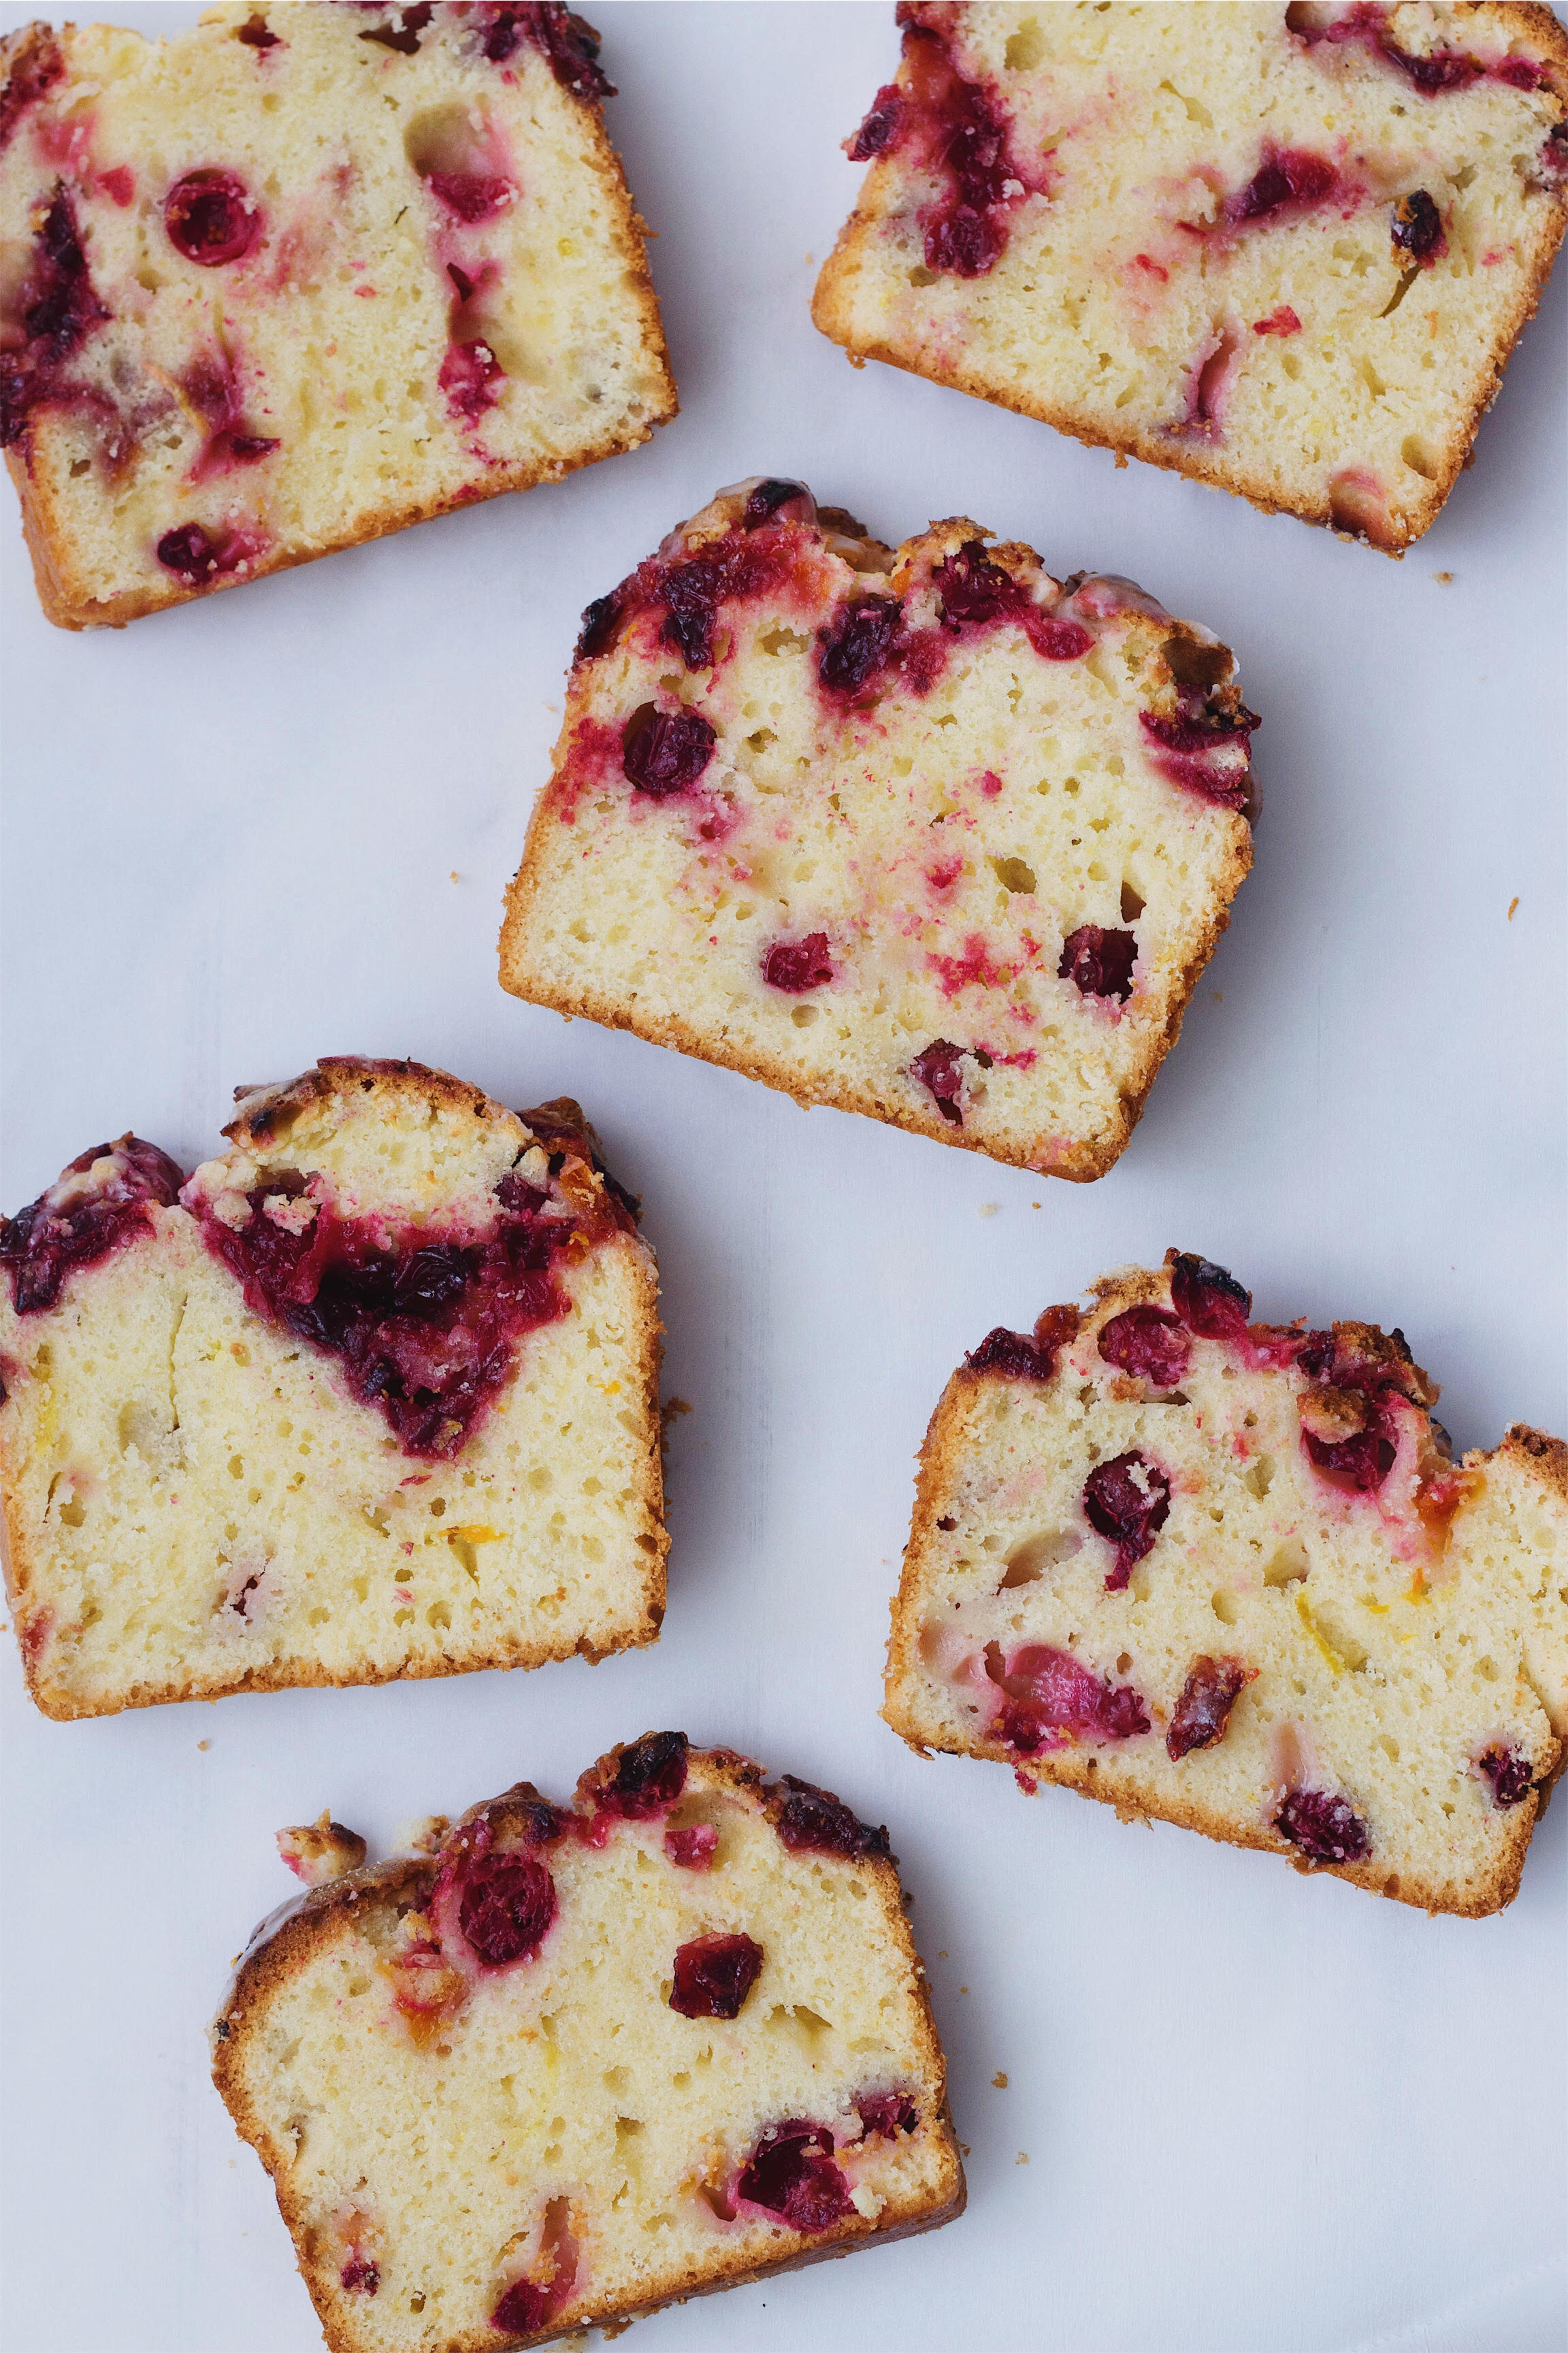 Cranberry Clementine Jam Pound Cake